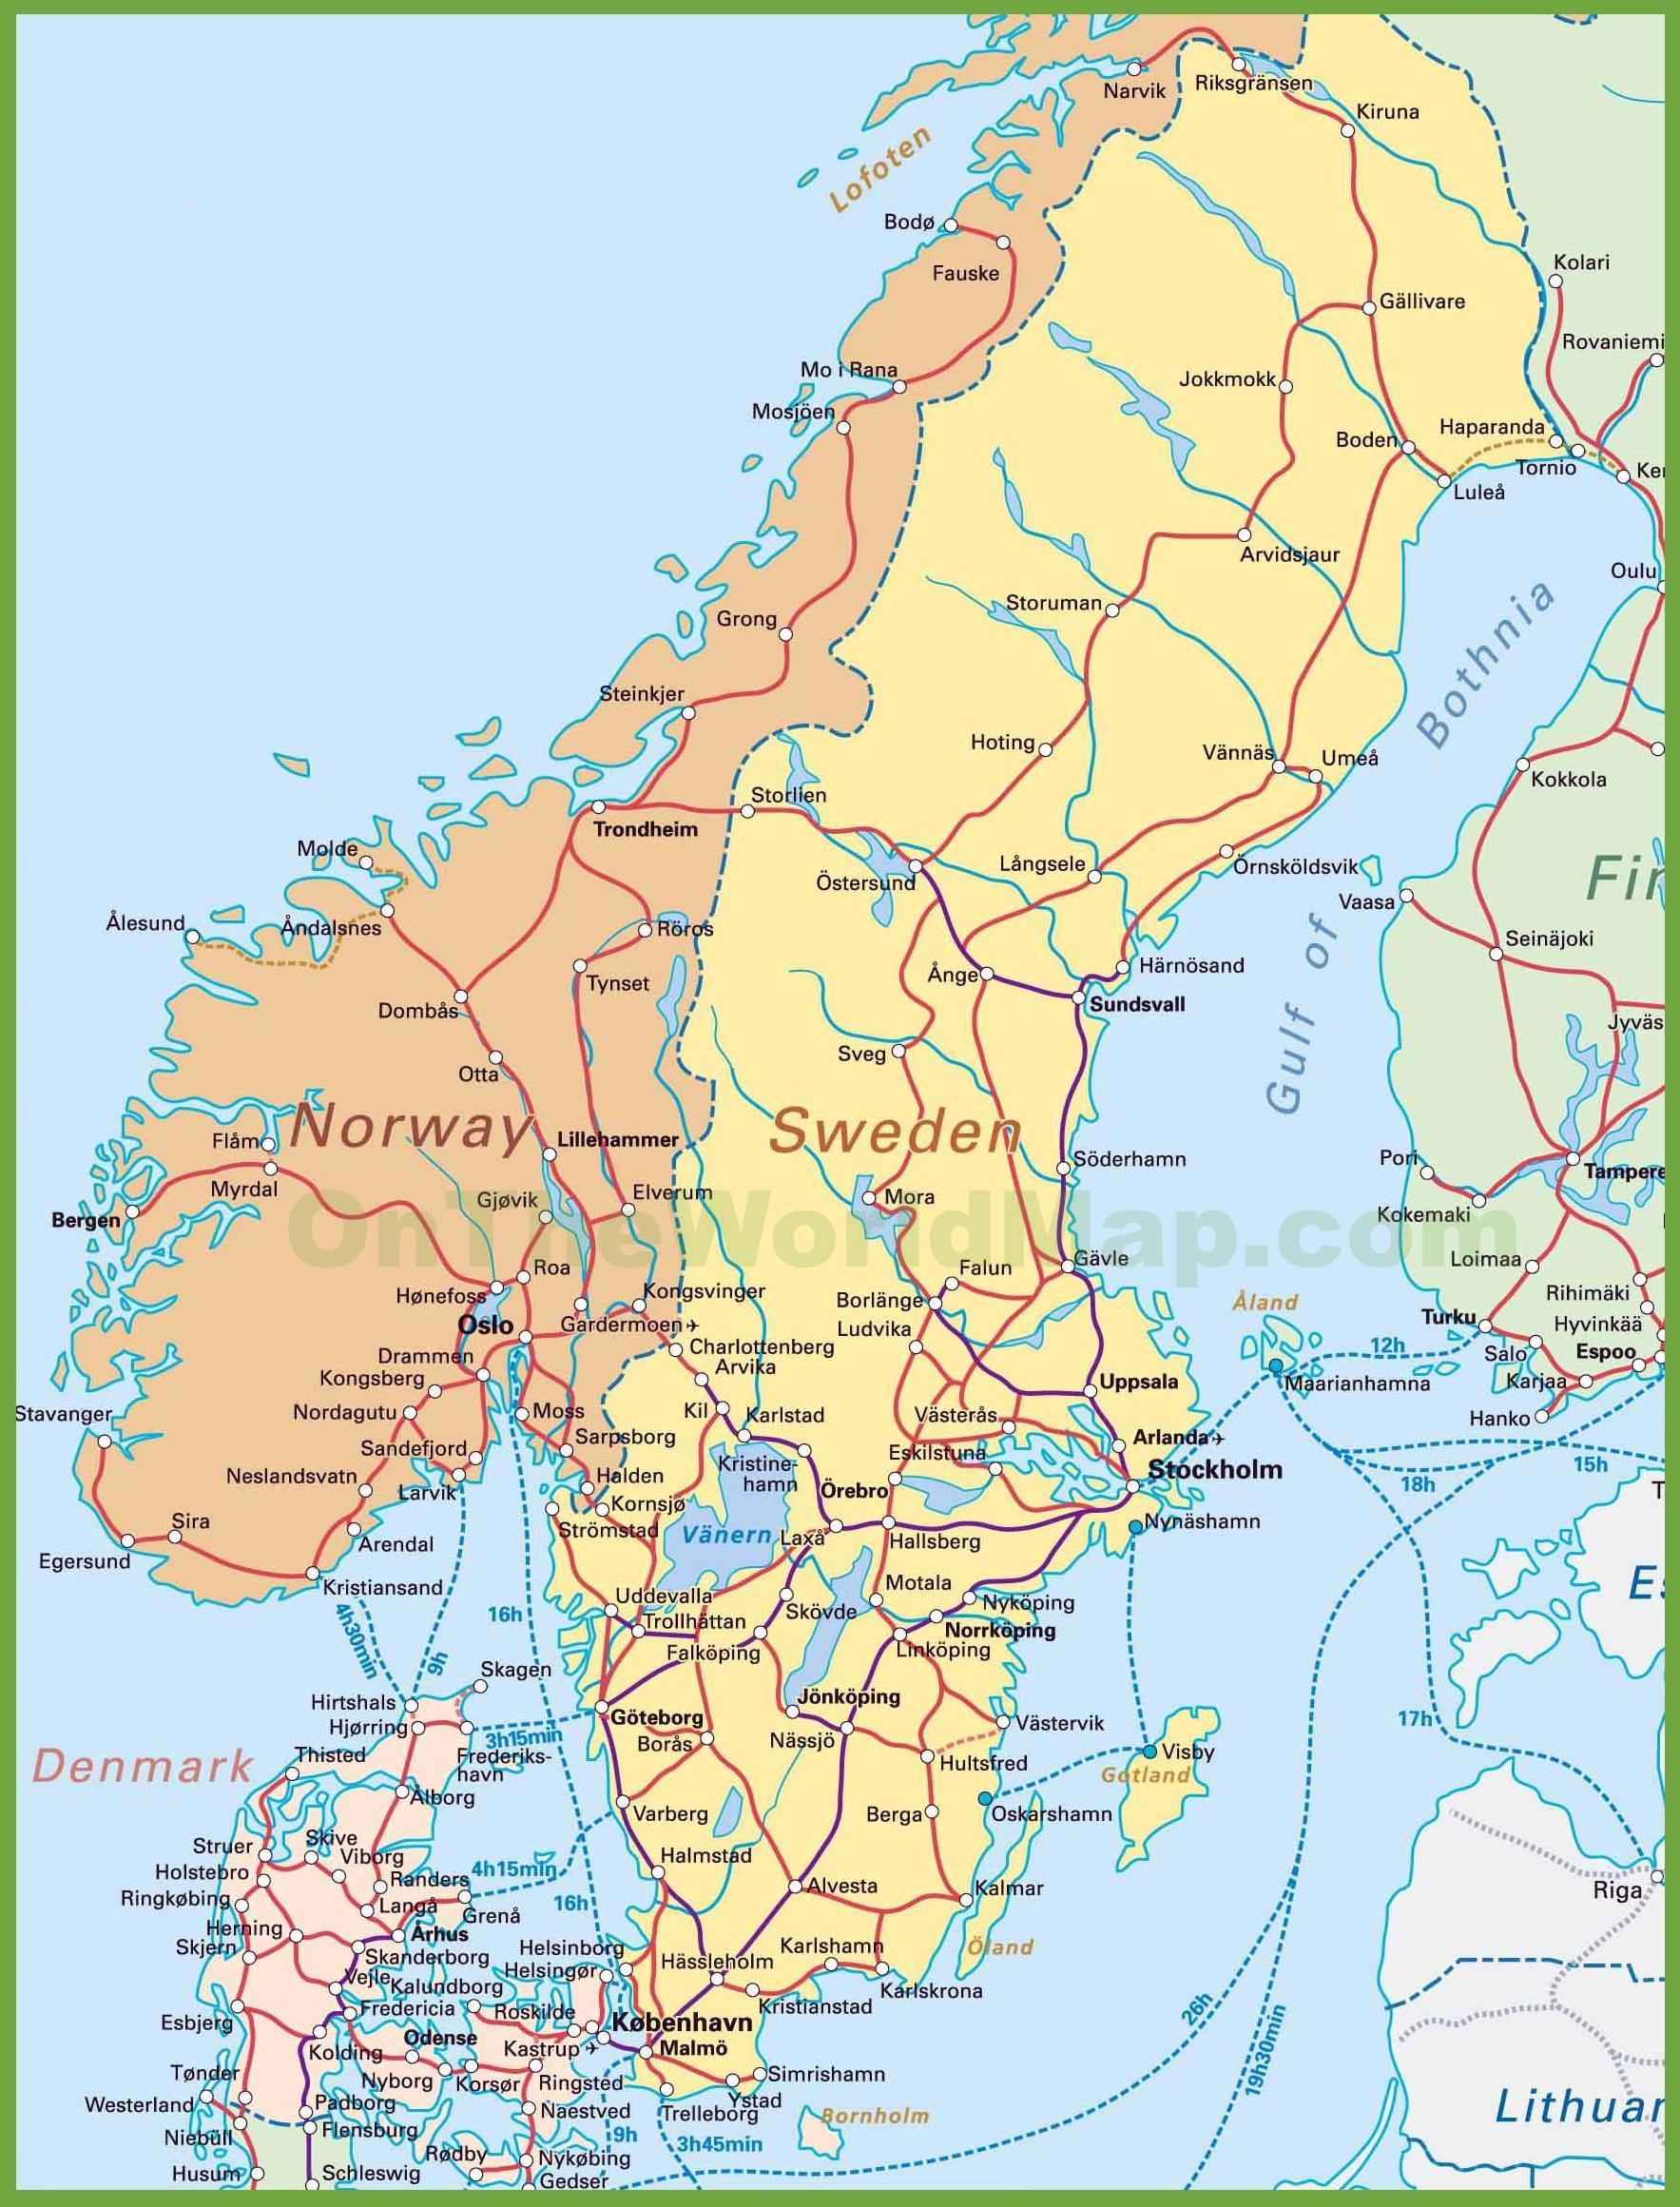 Norge Danmark Kort Kort Over Danmark Og Norge I Det Nordlige